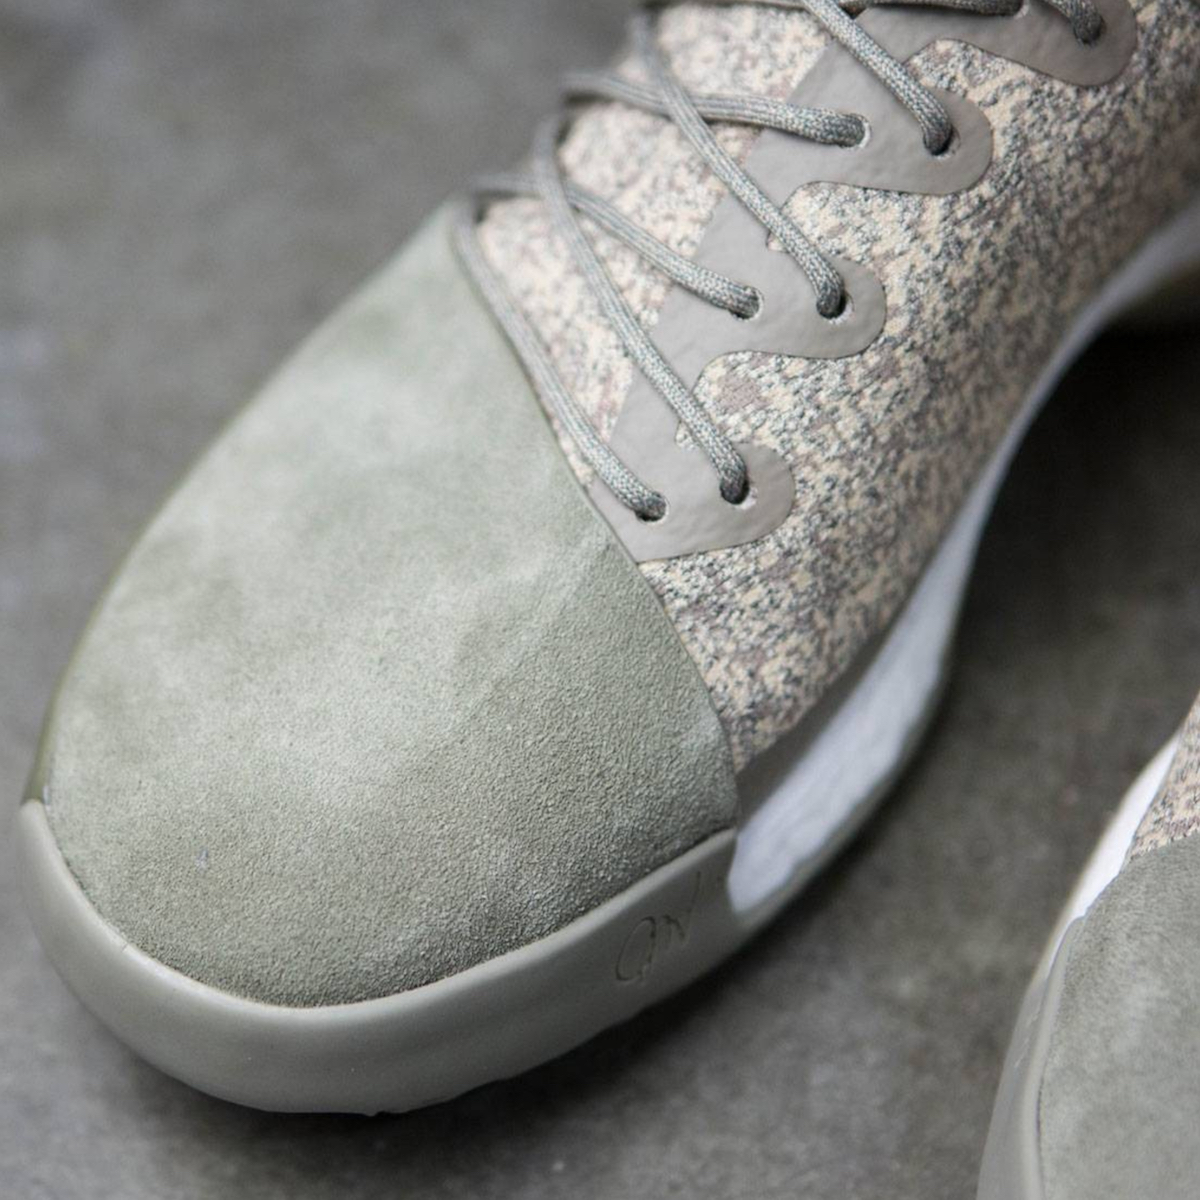 James Adidas Induriscono Vol 1 Cargo PWKImMyinw